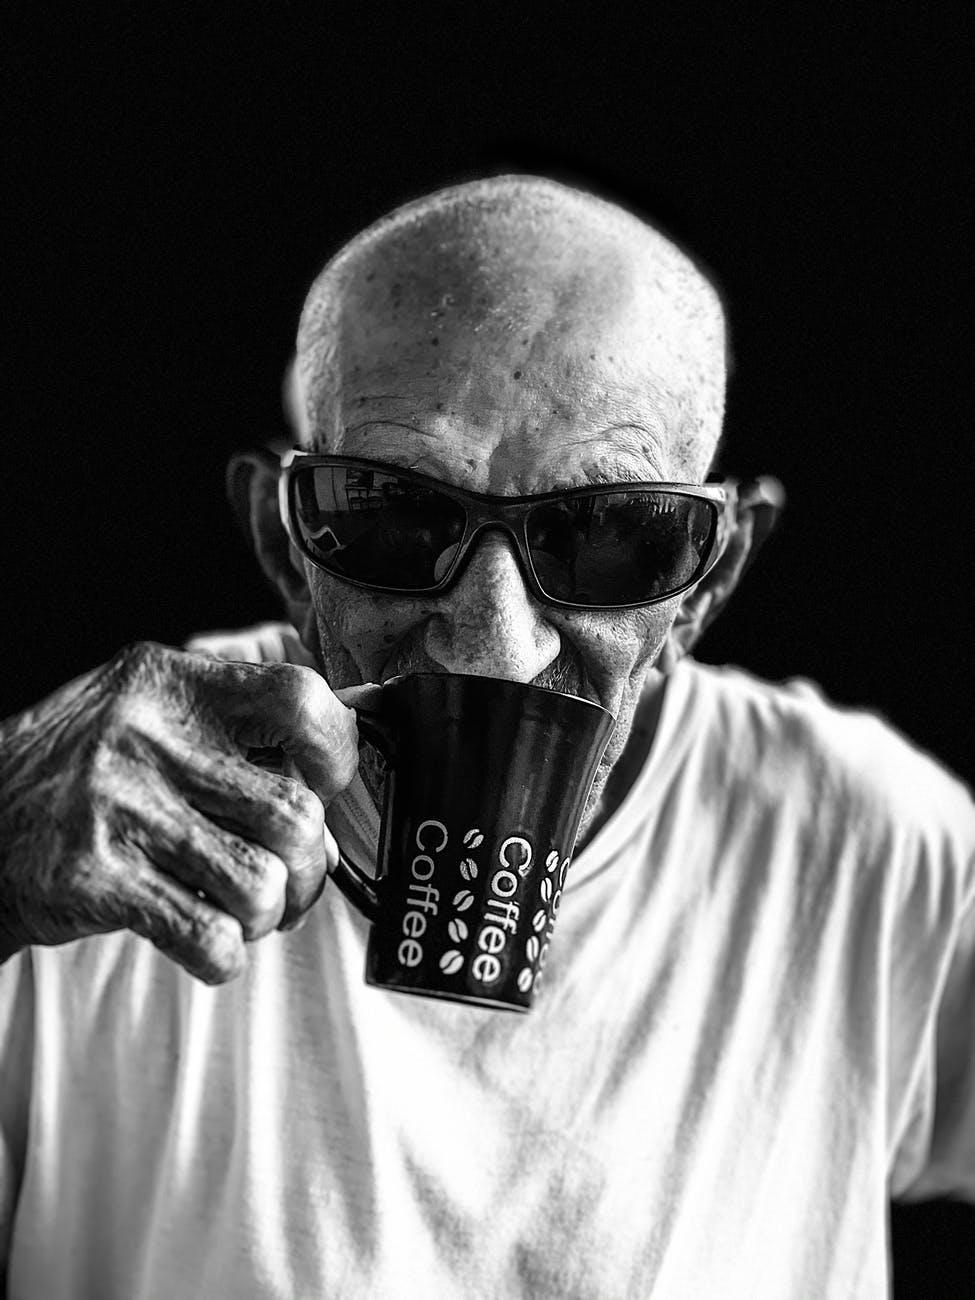 man in white crew neck shirt wearing black sunglasses holding black ceramic mug